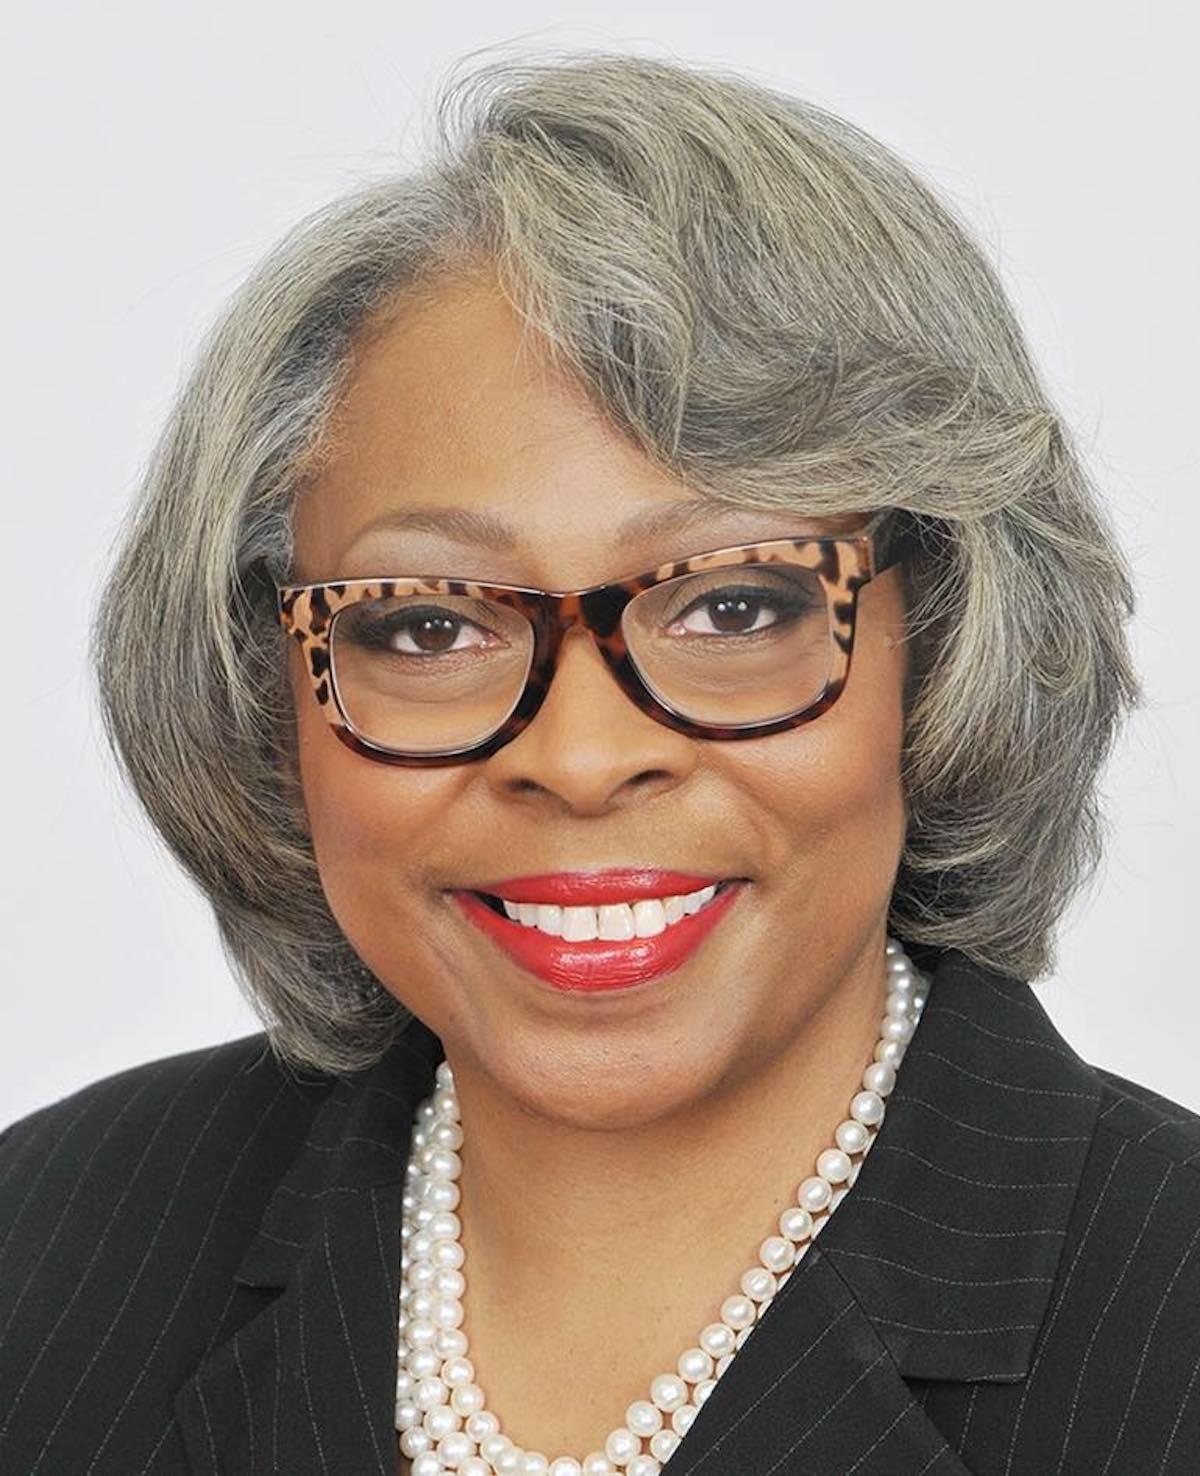 Linda Fields, Willoughby Avenue, The Five Fifths, KOLUMN Magazine, KOLUMN, African American Politics, Black in Politics